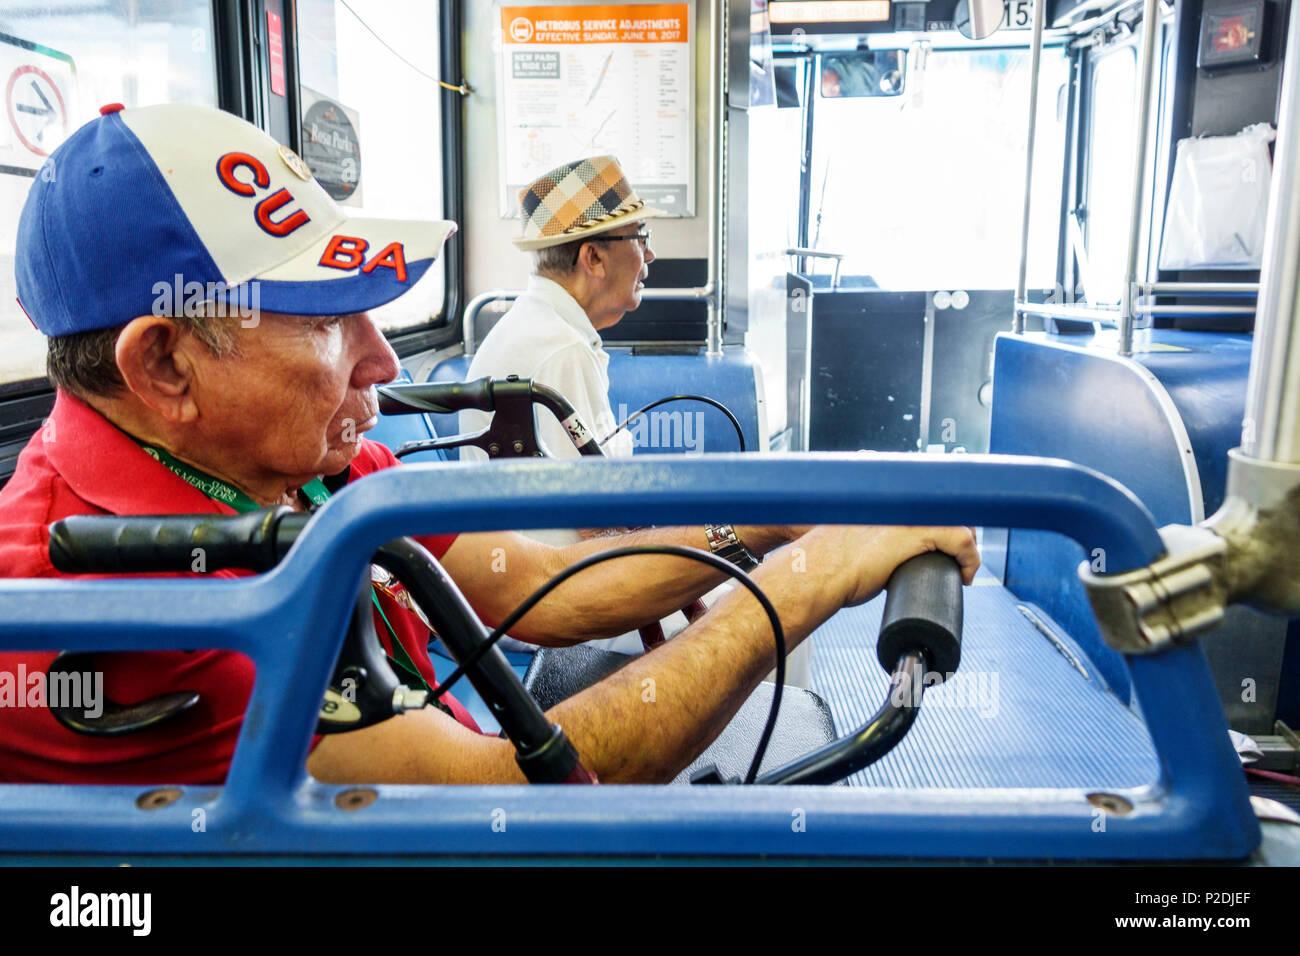 Florida Miami Beach bus Miami-Dade Metrobus public transportation Hispanic senior man walker baseball cap passengers - Stock Image